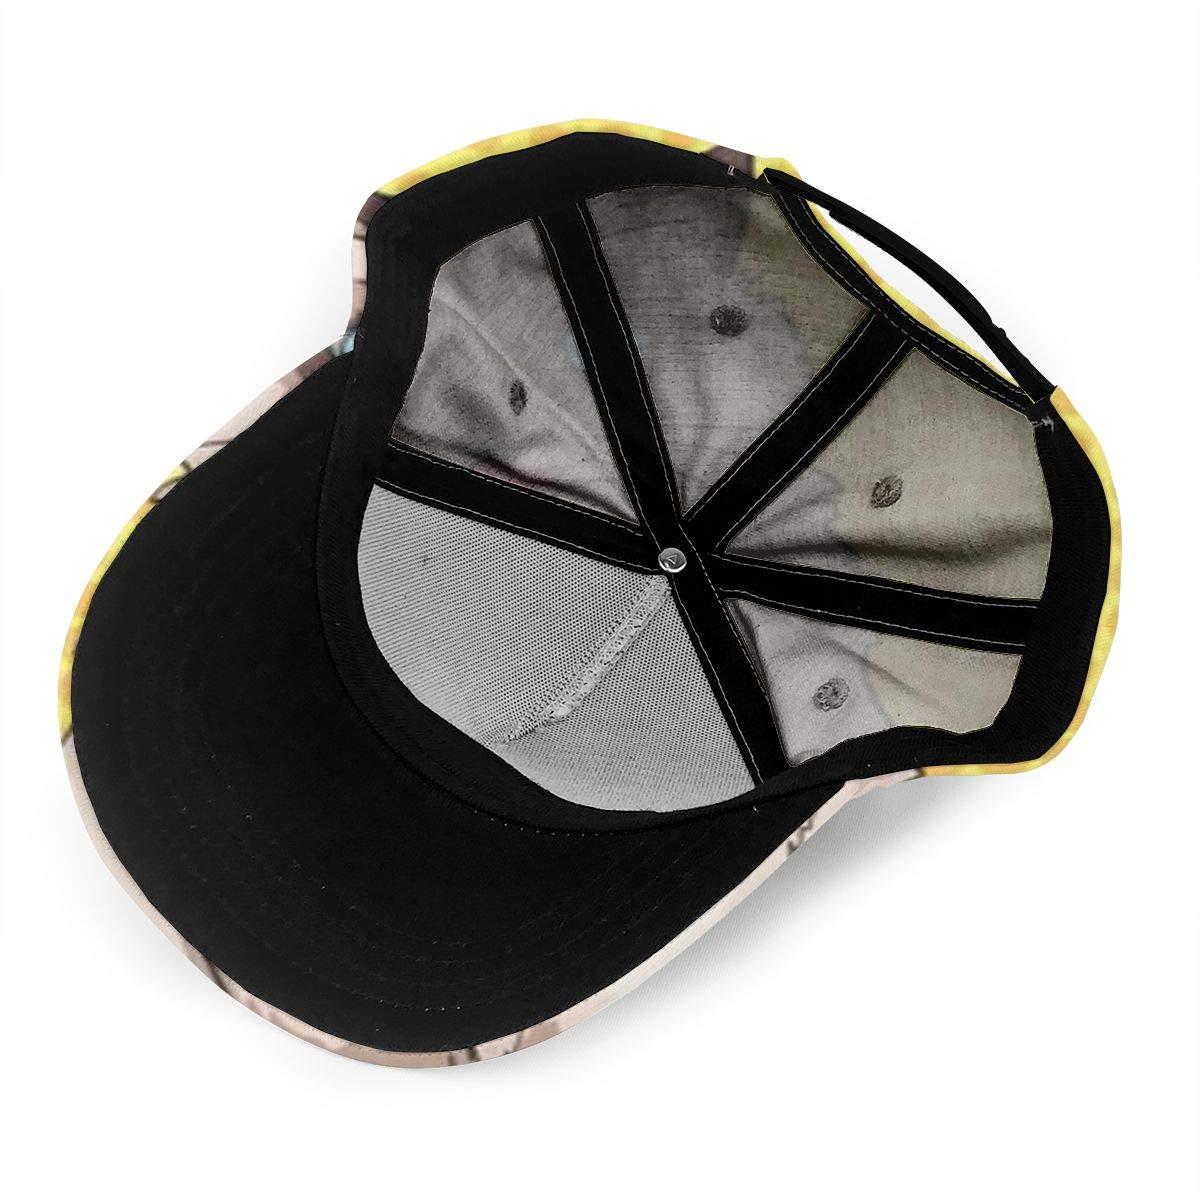 SKOKT Pet Siamese Printing Fashion Classic Baseball Cap Unisex Adjustable Velcro